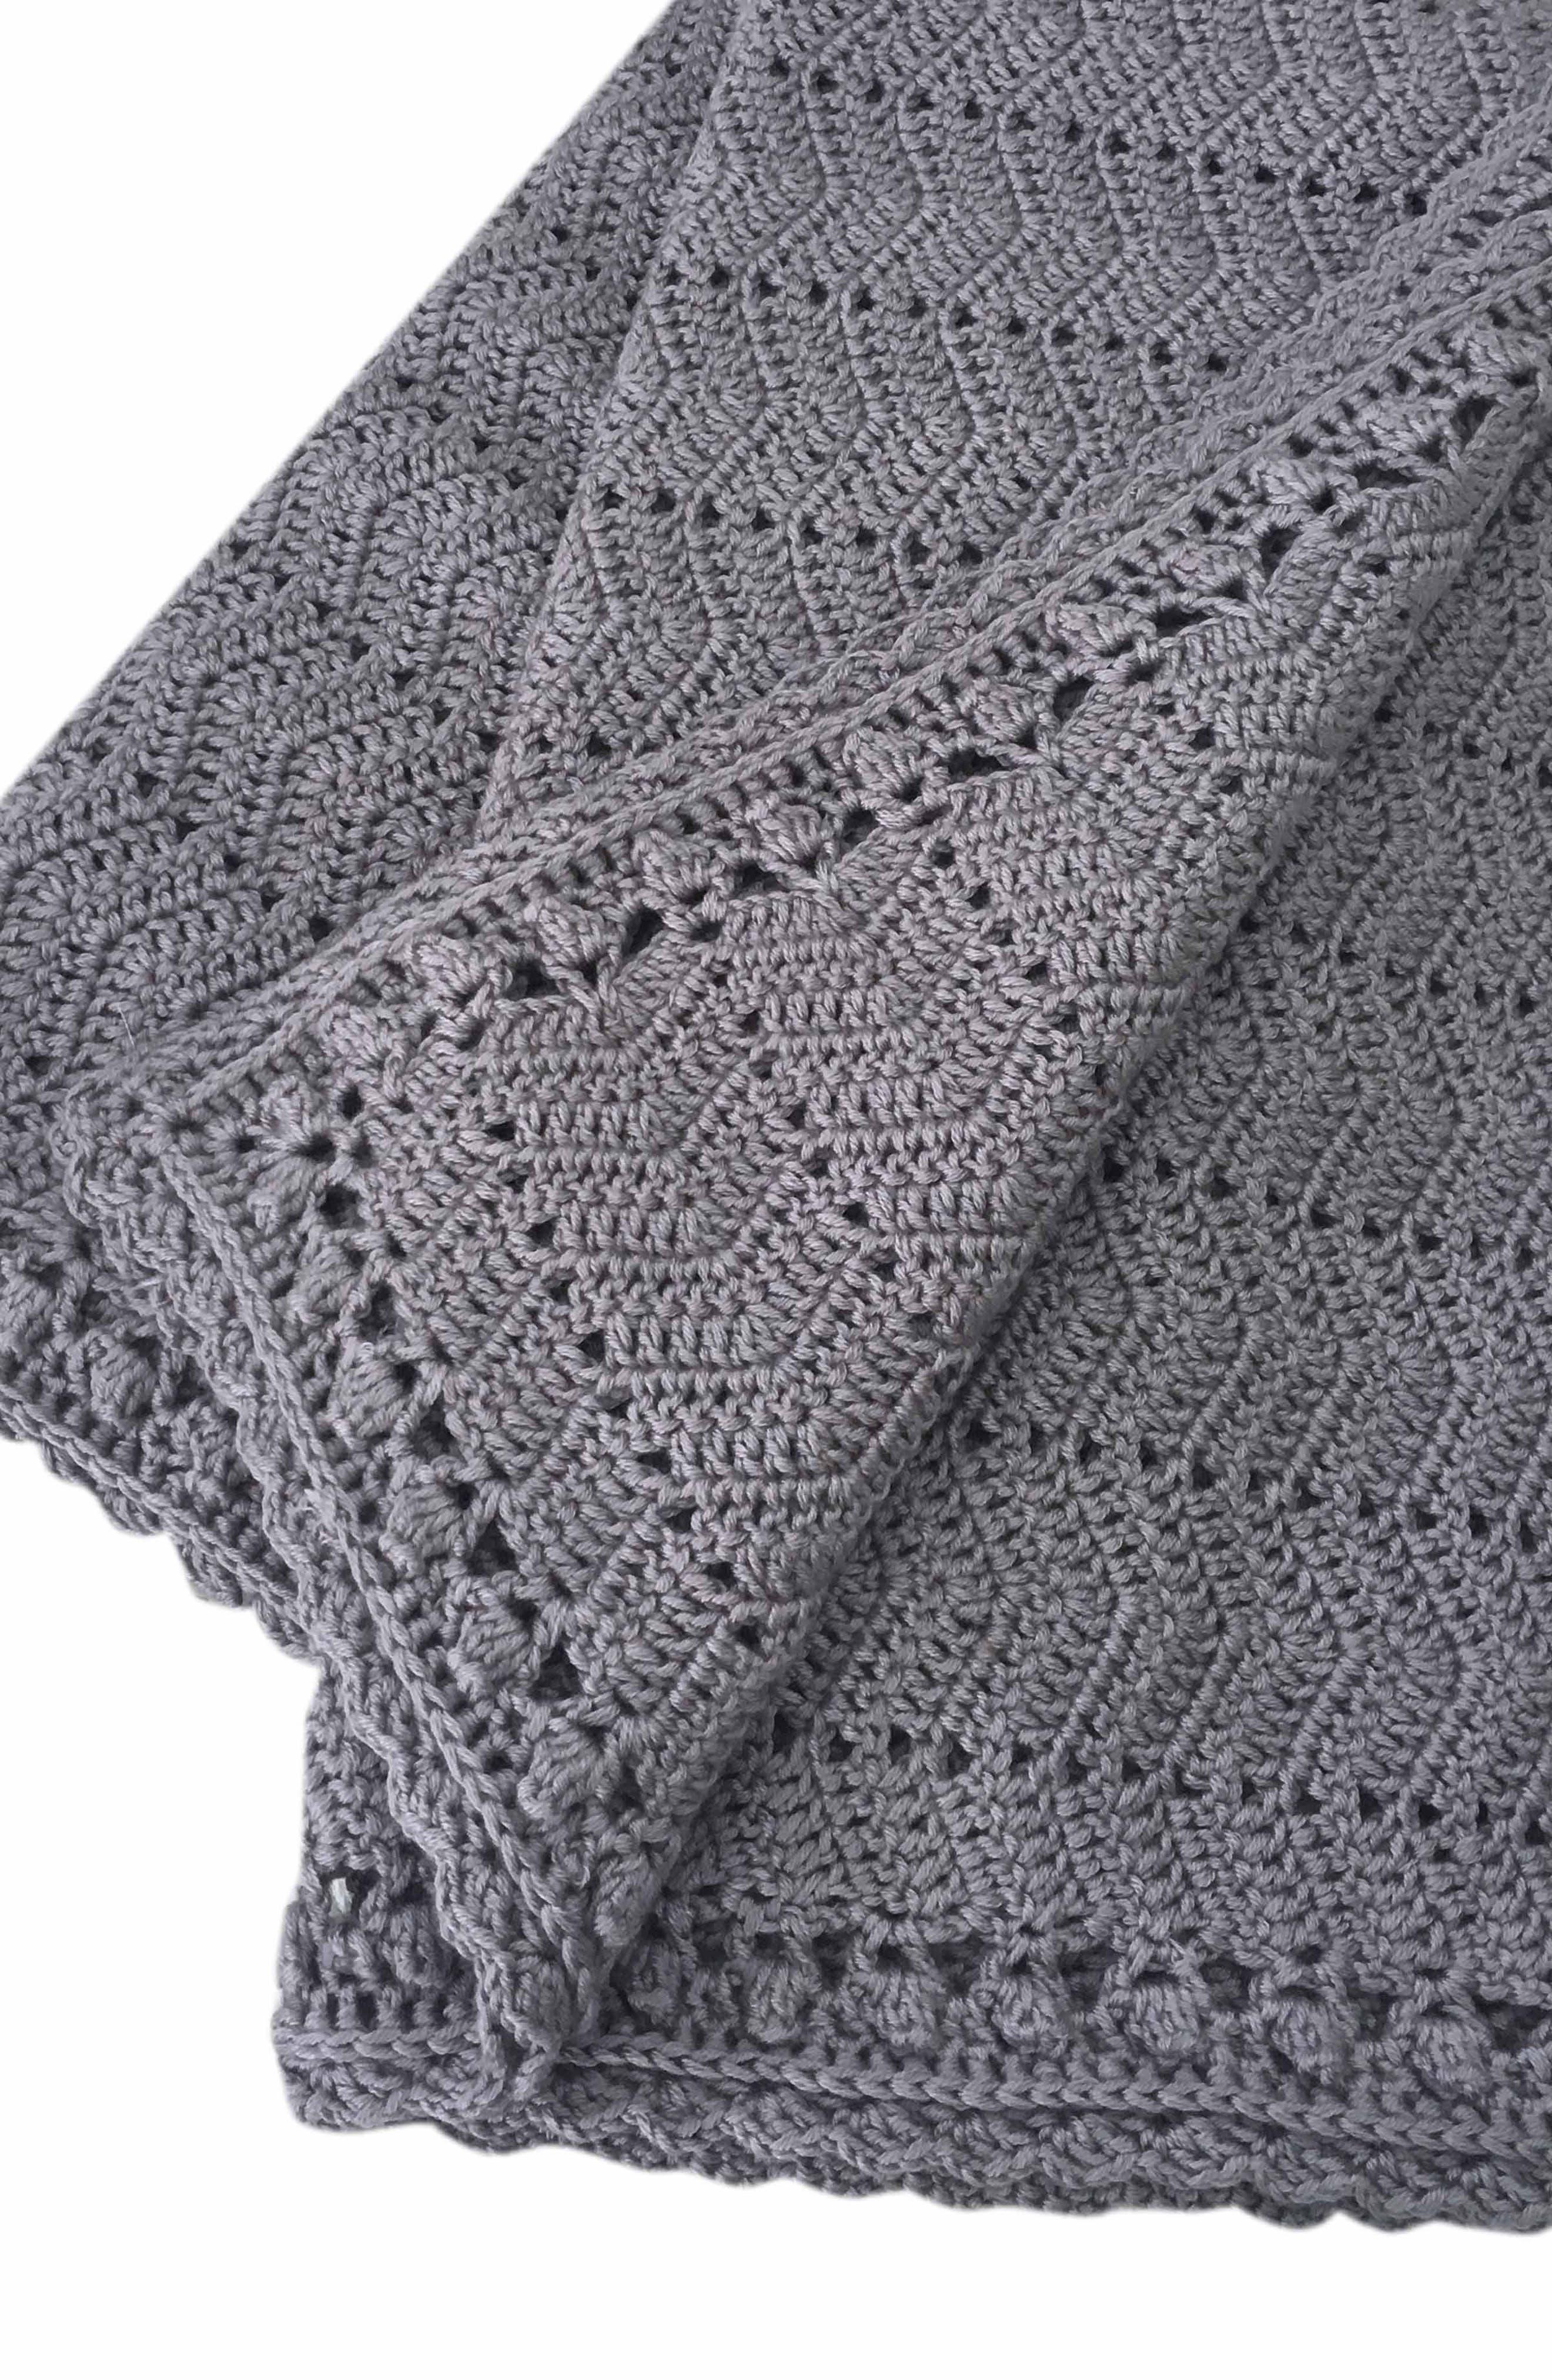 Ripple Crocheted Blanket,                             Main thumbnail 1, color,                             020